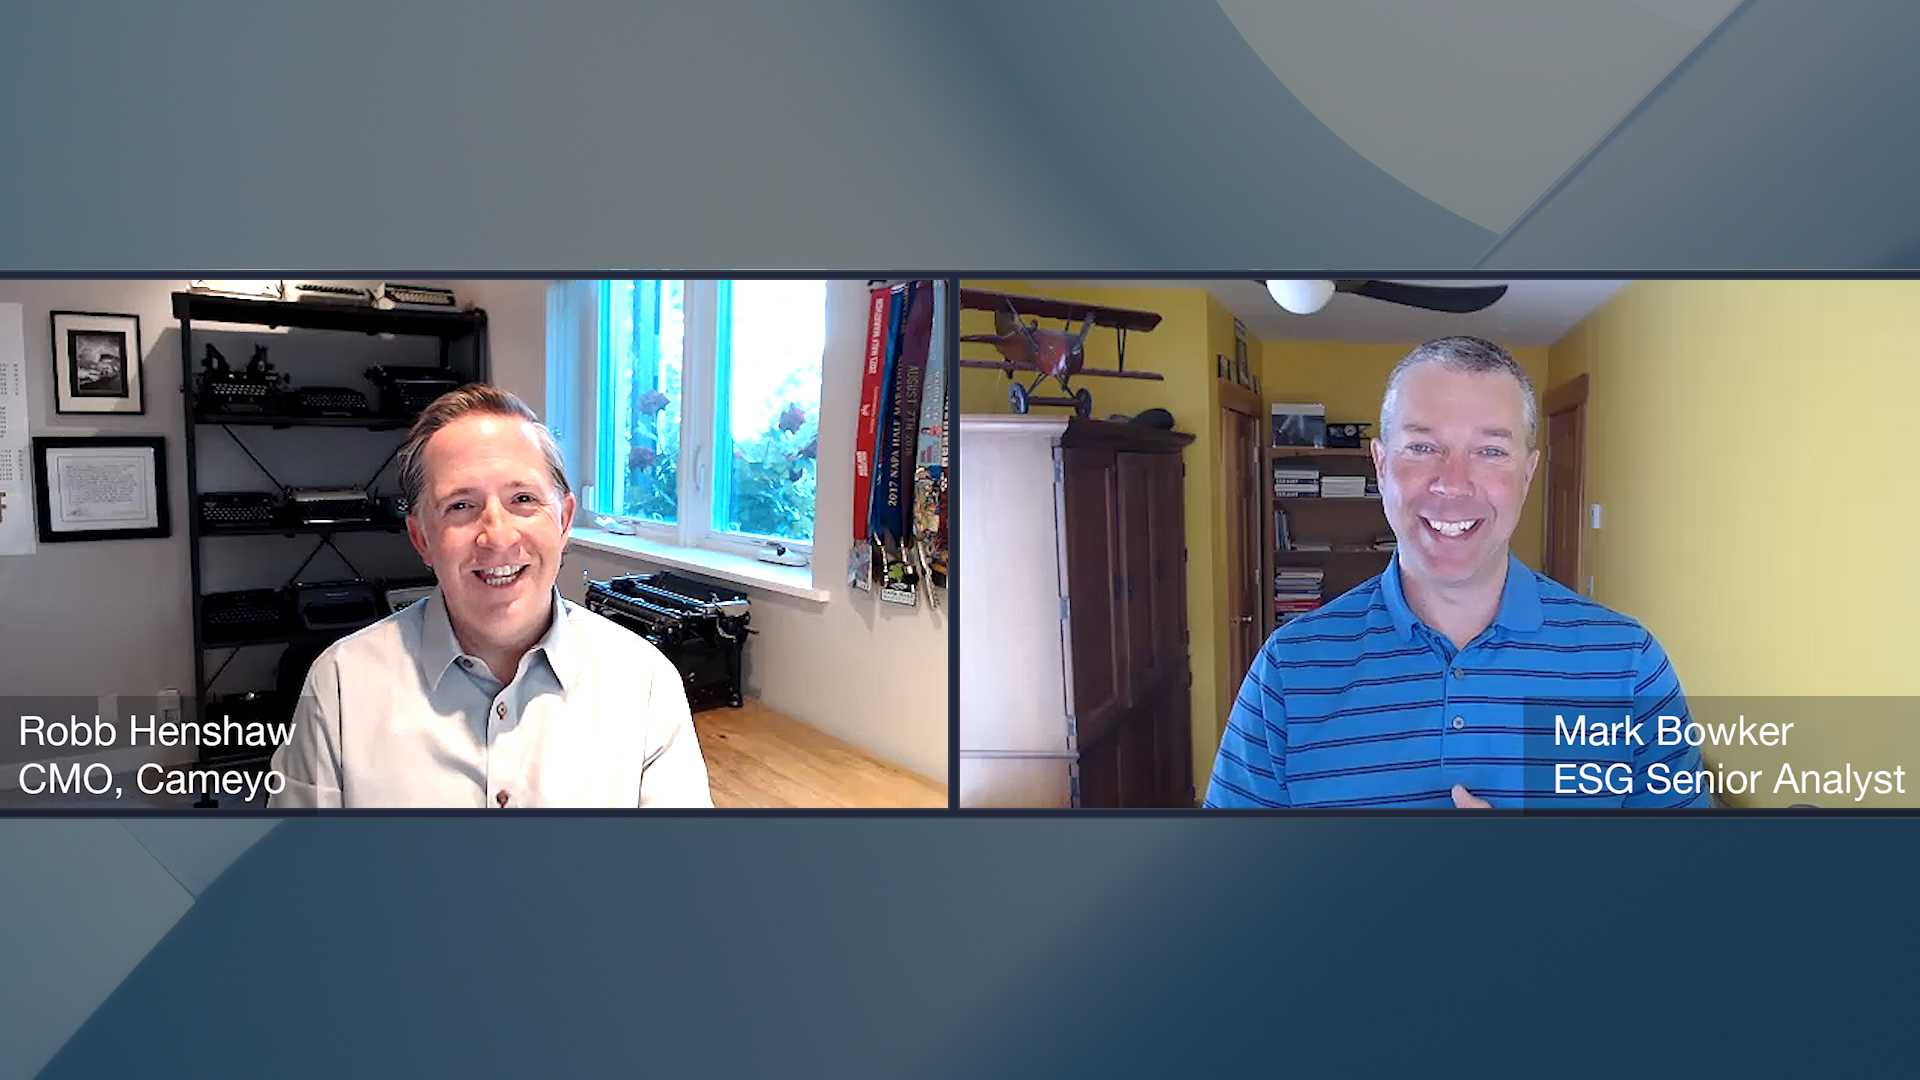 ESG360 Video: Digital Workspace Ecosystem Conversation with Robb Henshaw of Cameyo